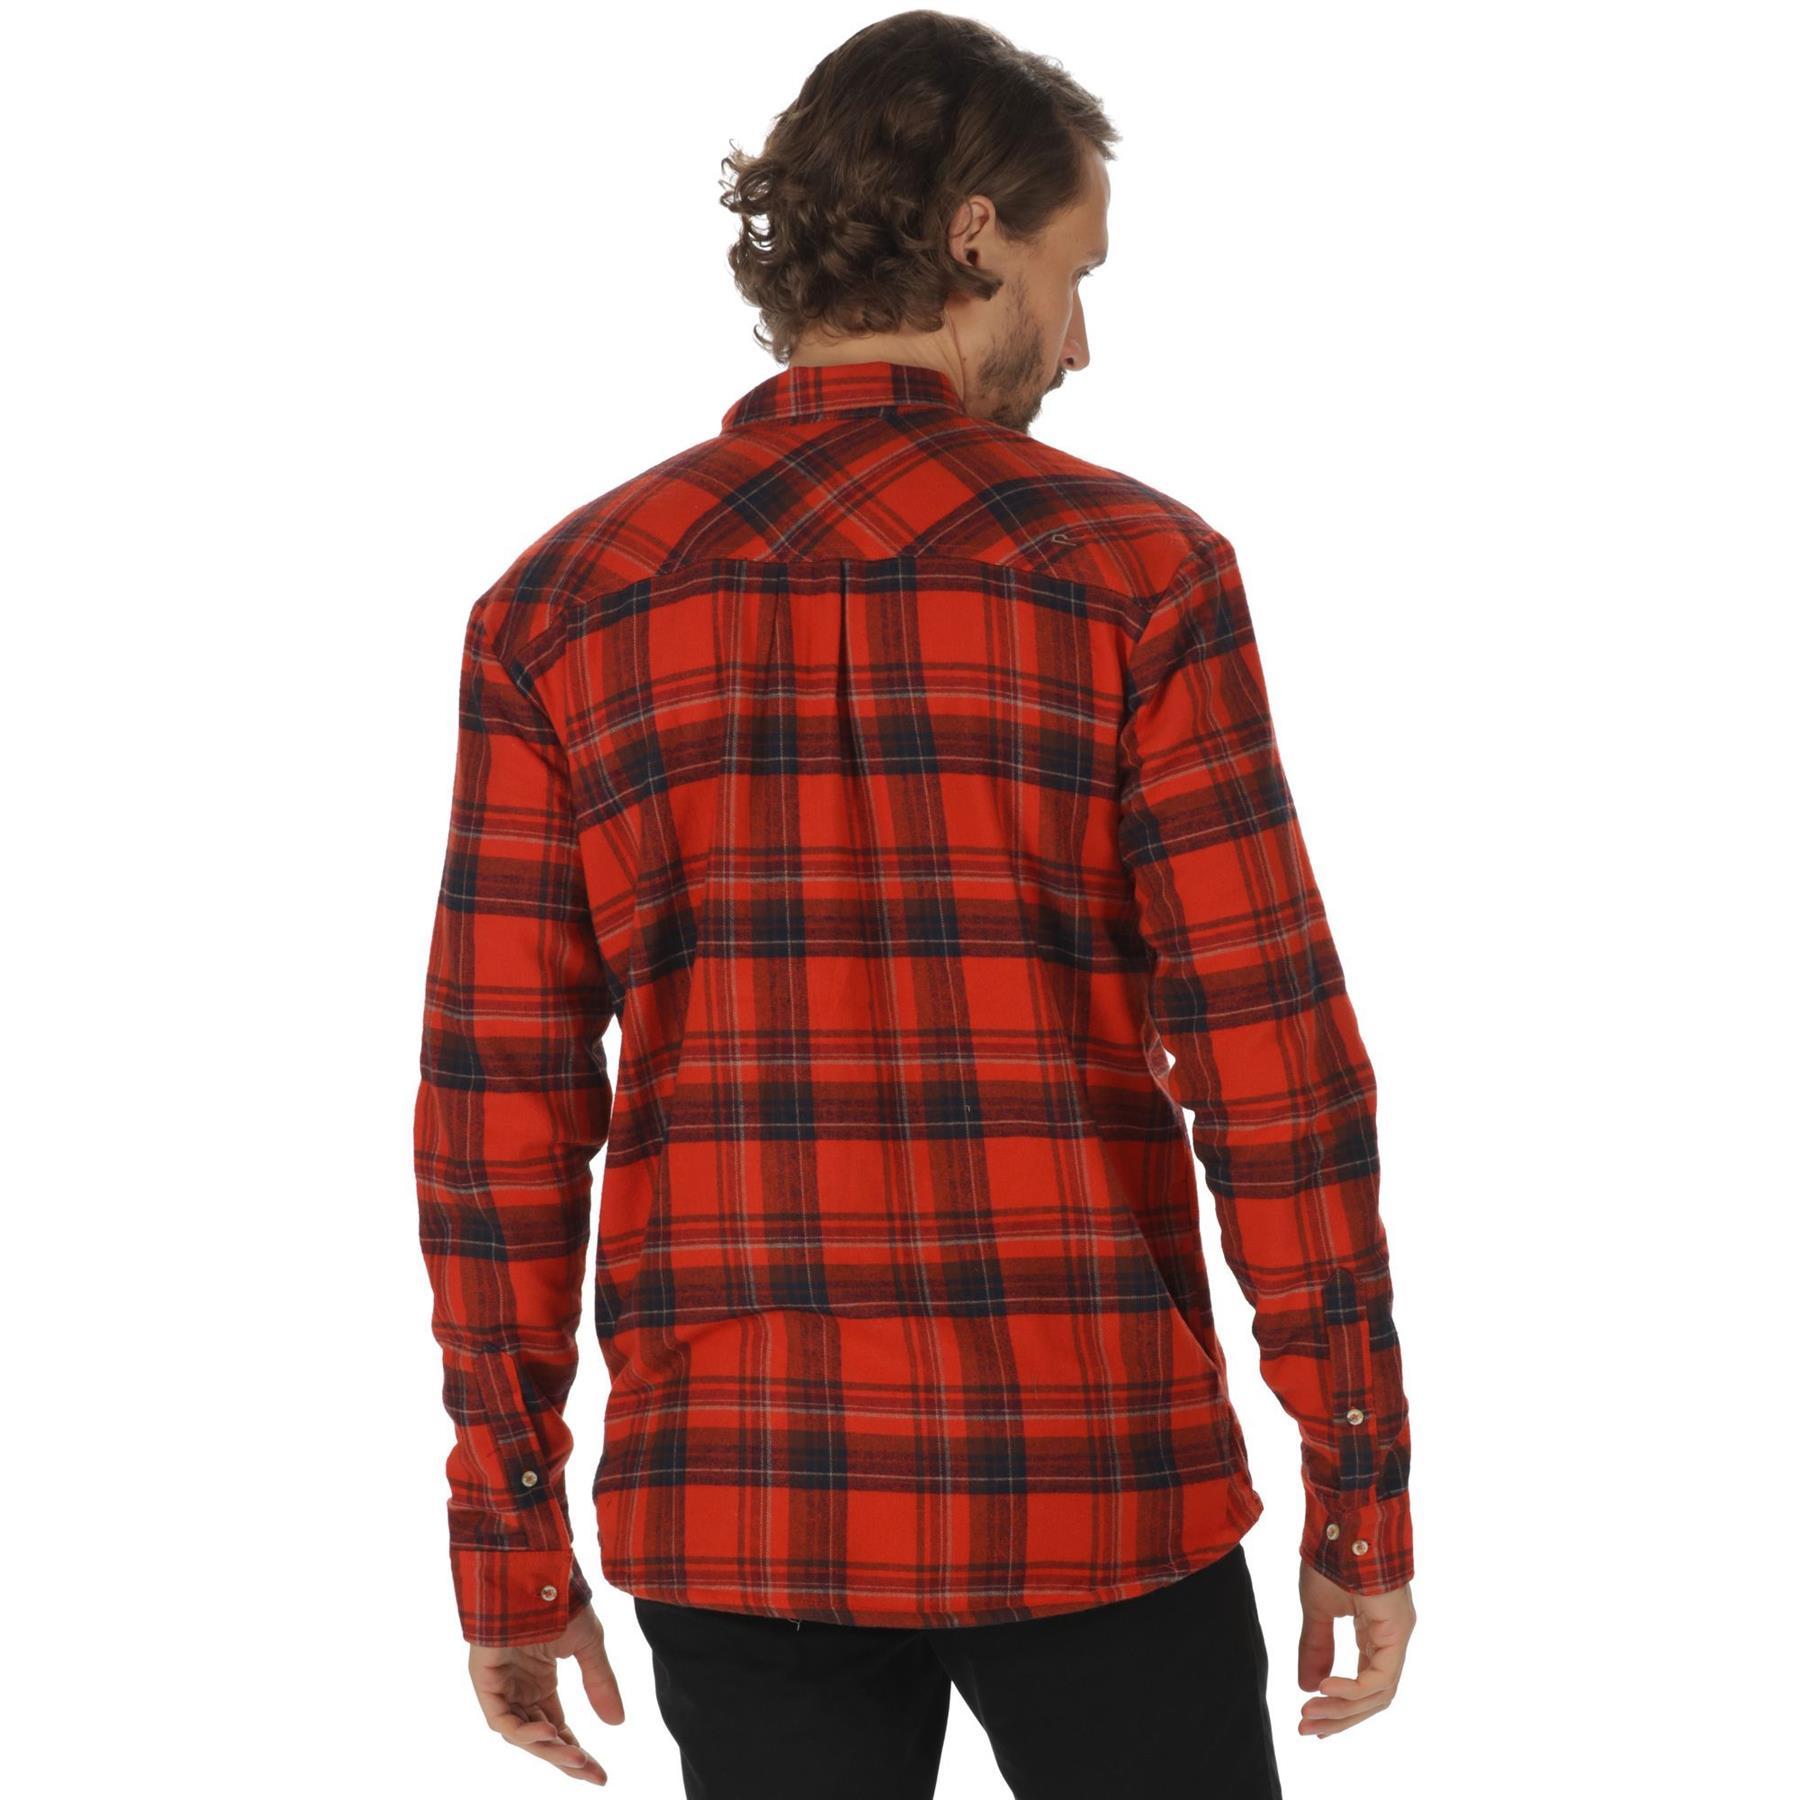 miniatuur 5 - Regatta Mens Tyrus Fleece Lined Long Sleeved Lumberjack Shirt Check